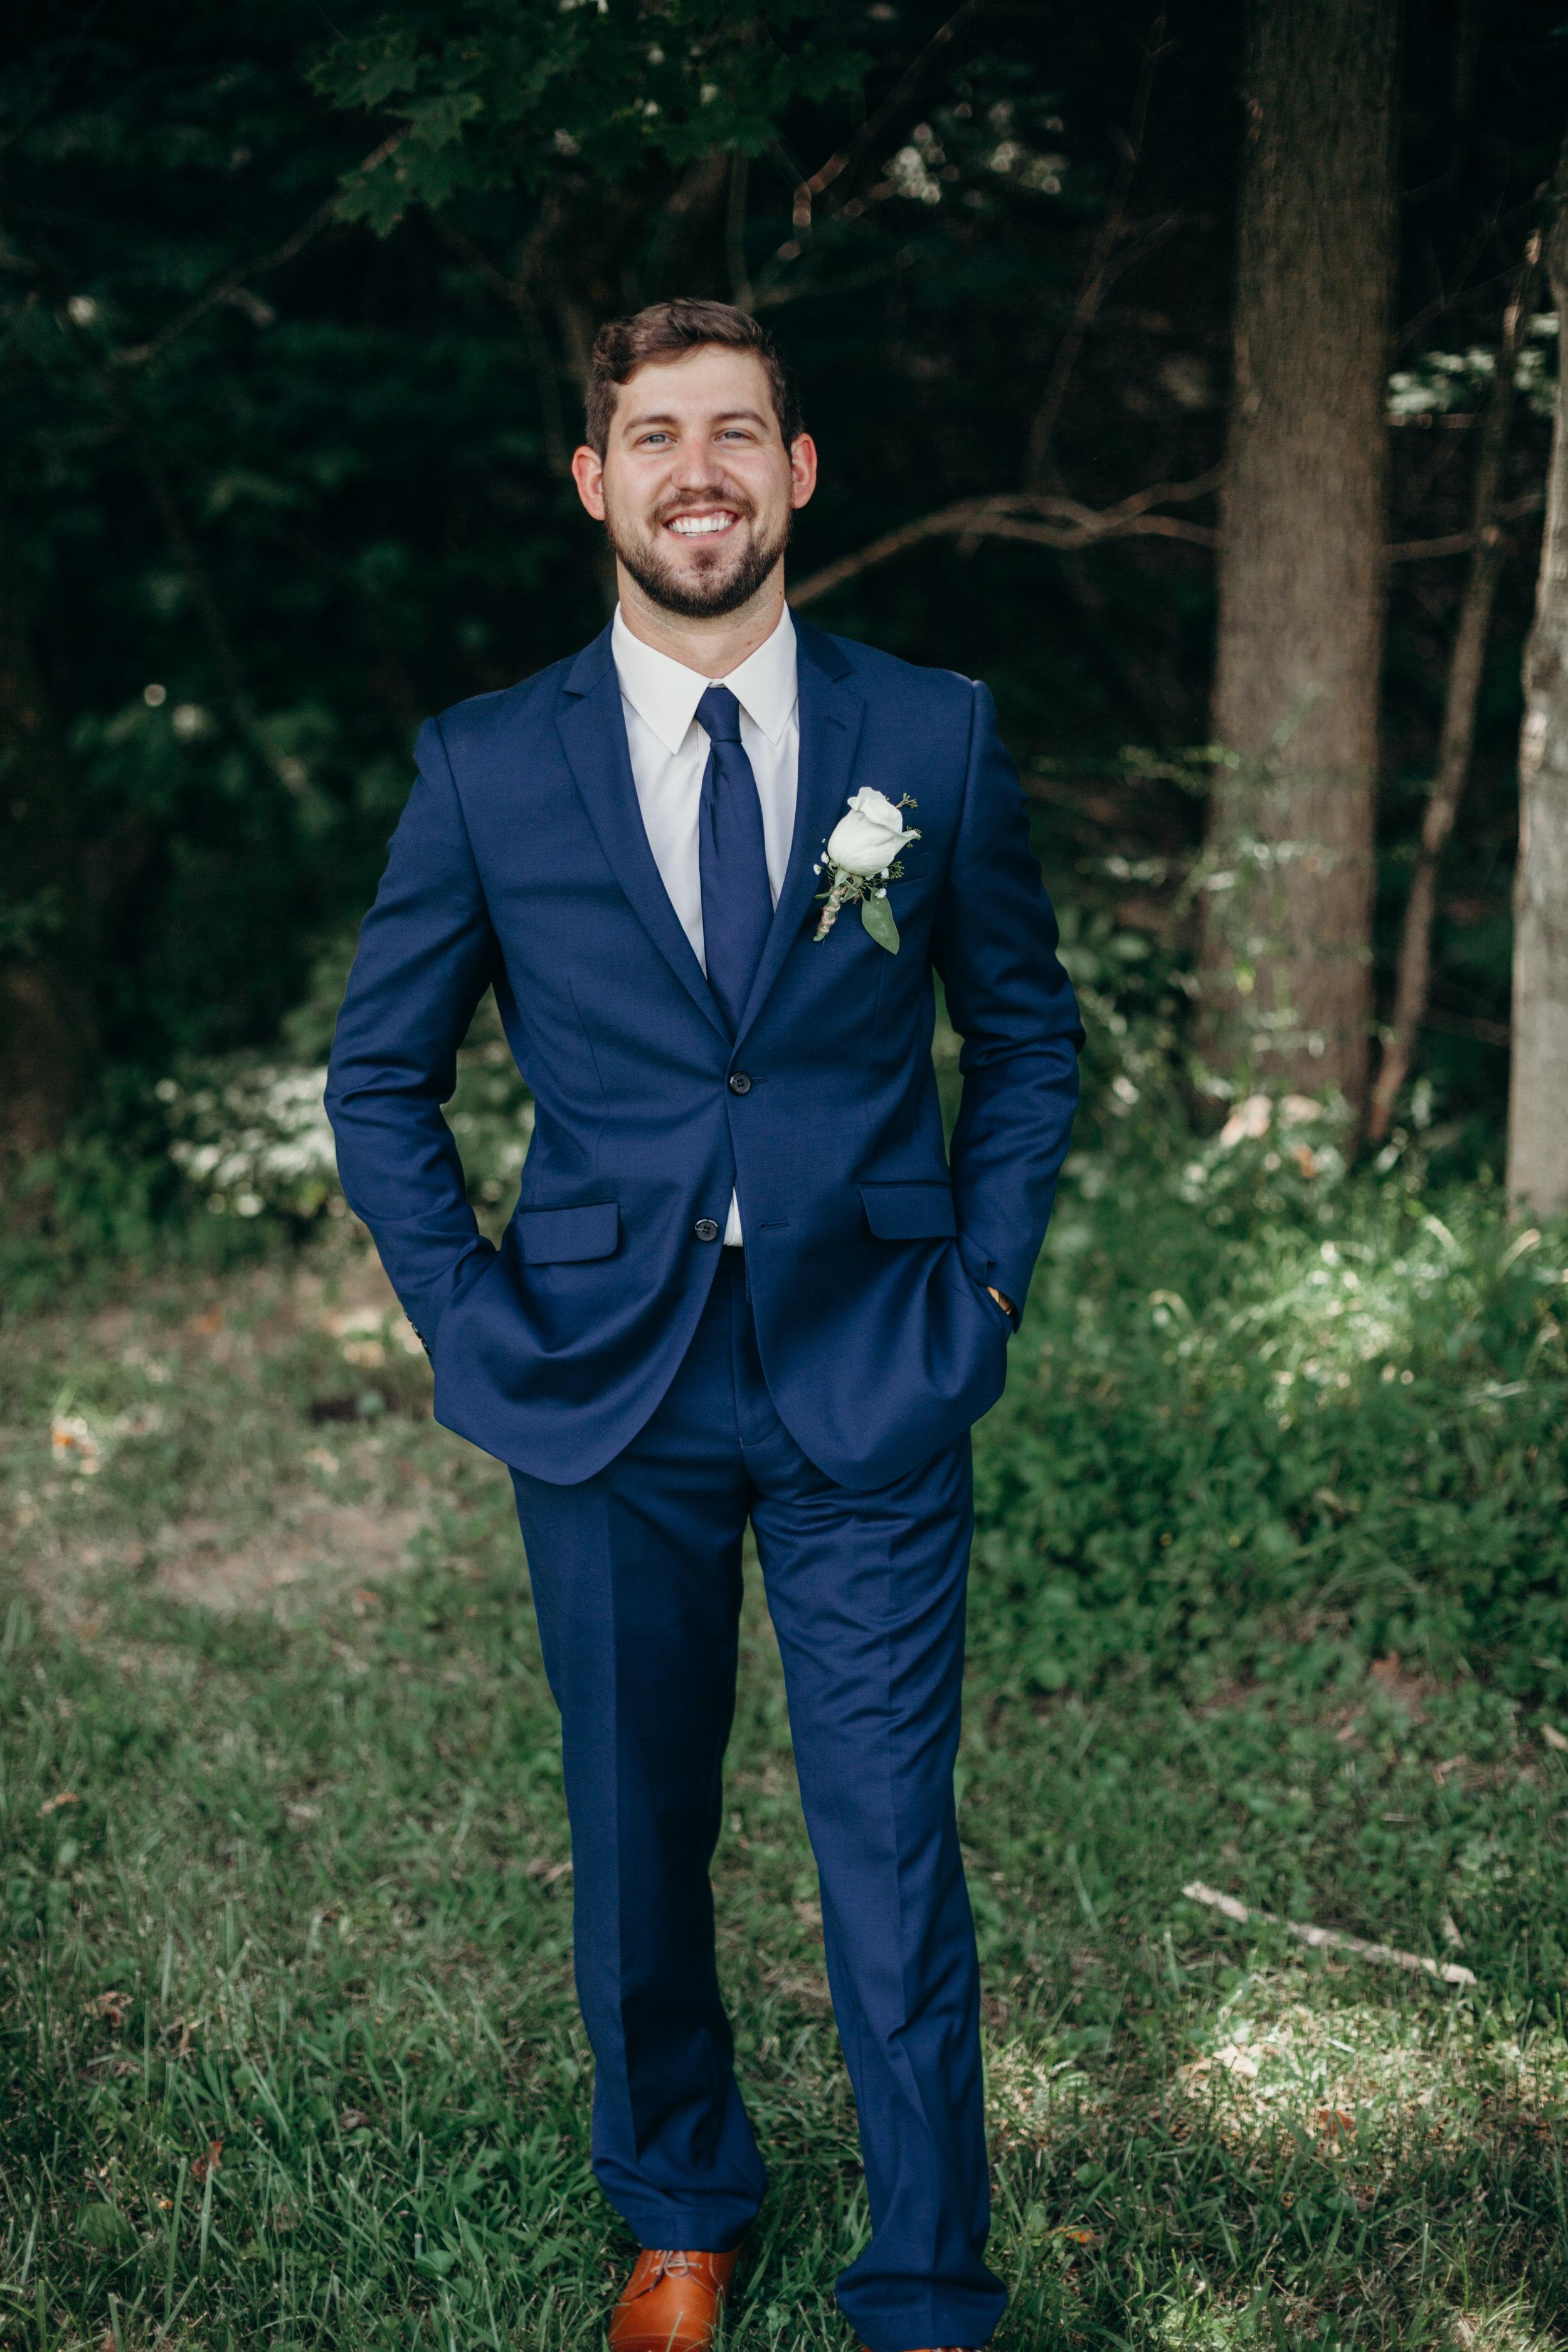 weddingday-18.jpg